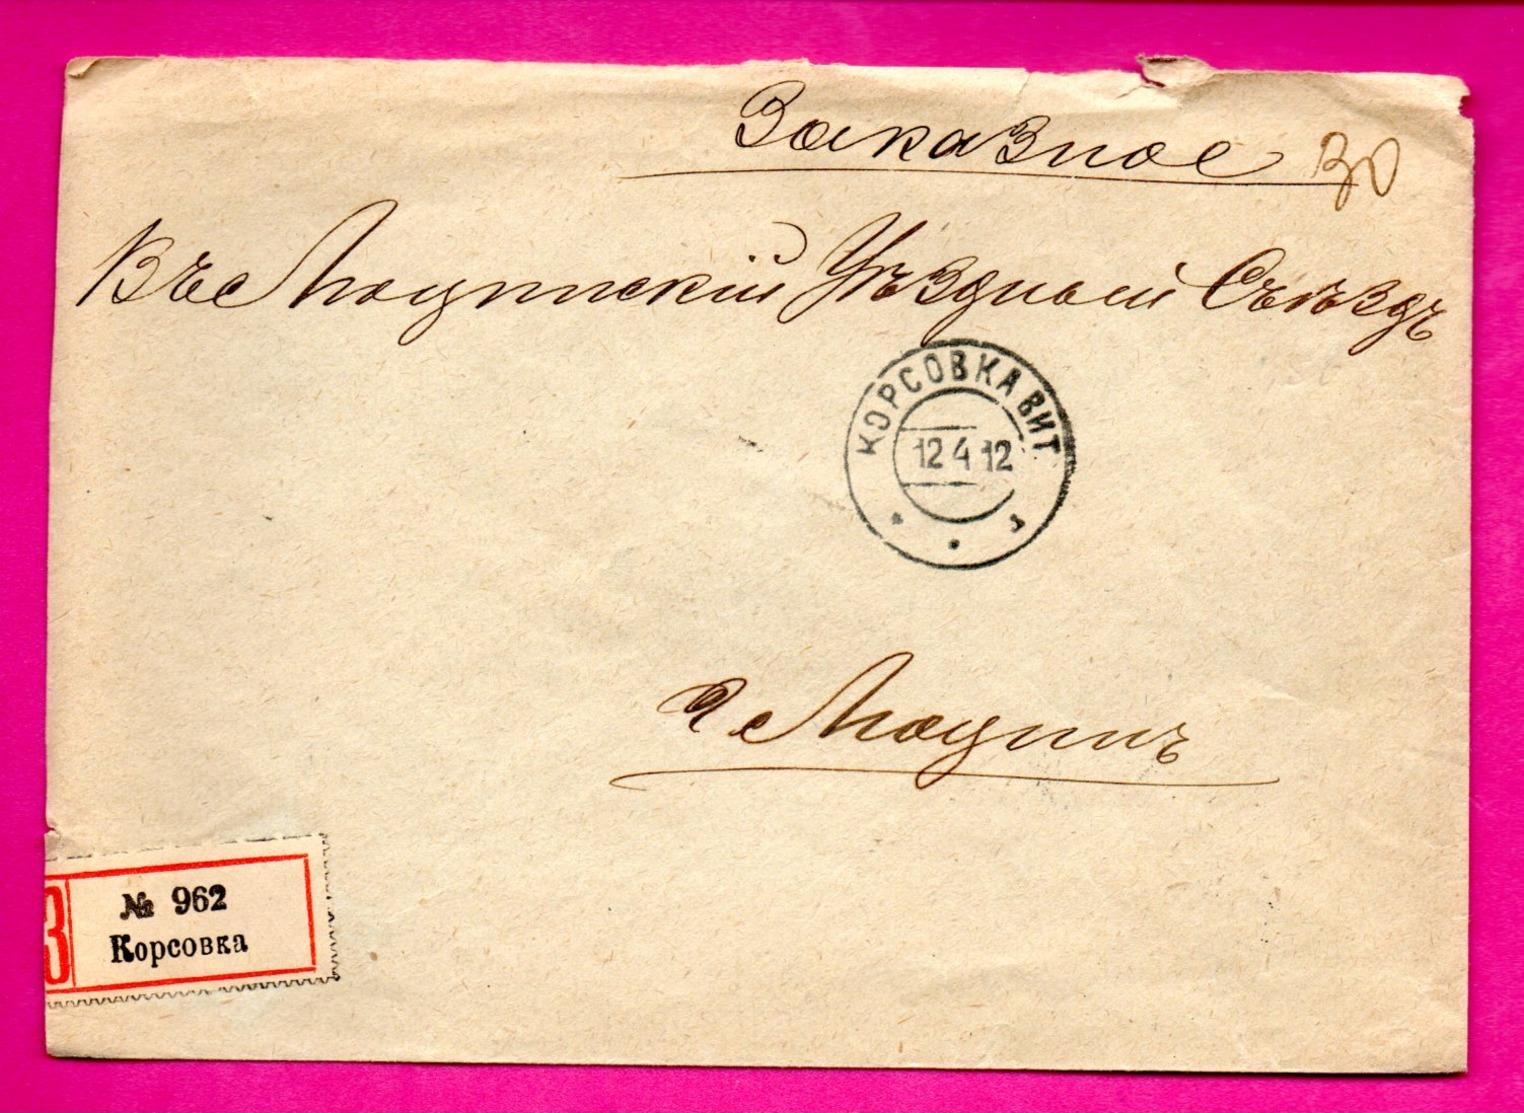 RUSSIA LATVIA REGISTERED LETTER USED KORSOVKA ( Karsava ) 1912s 640 - 1857-1916 Empire